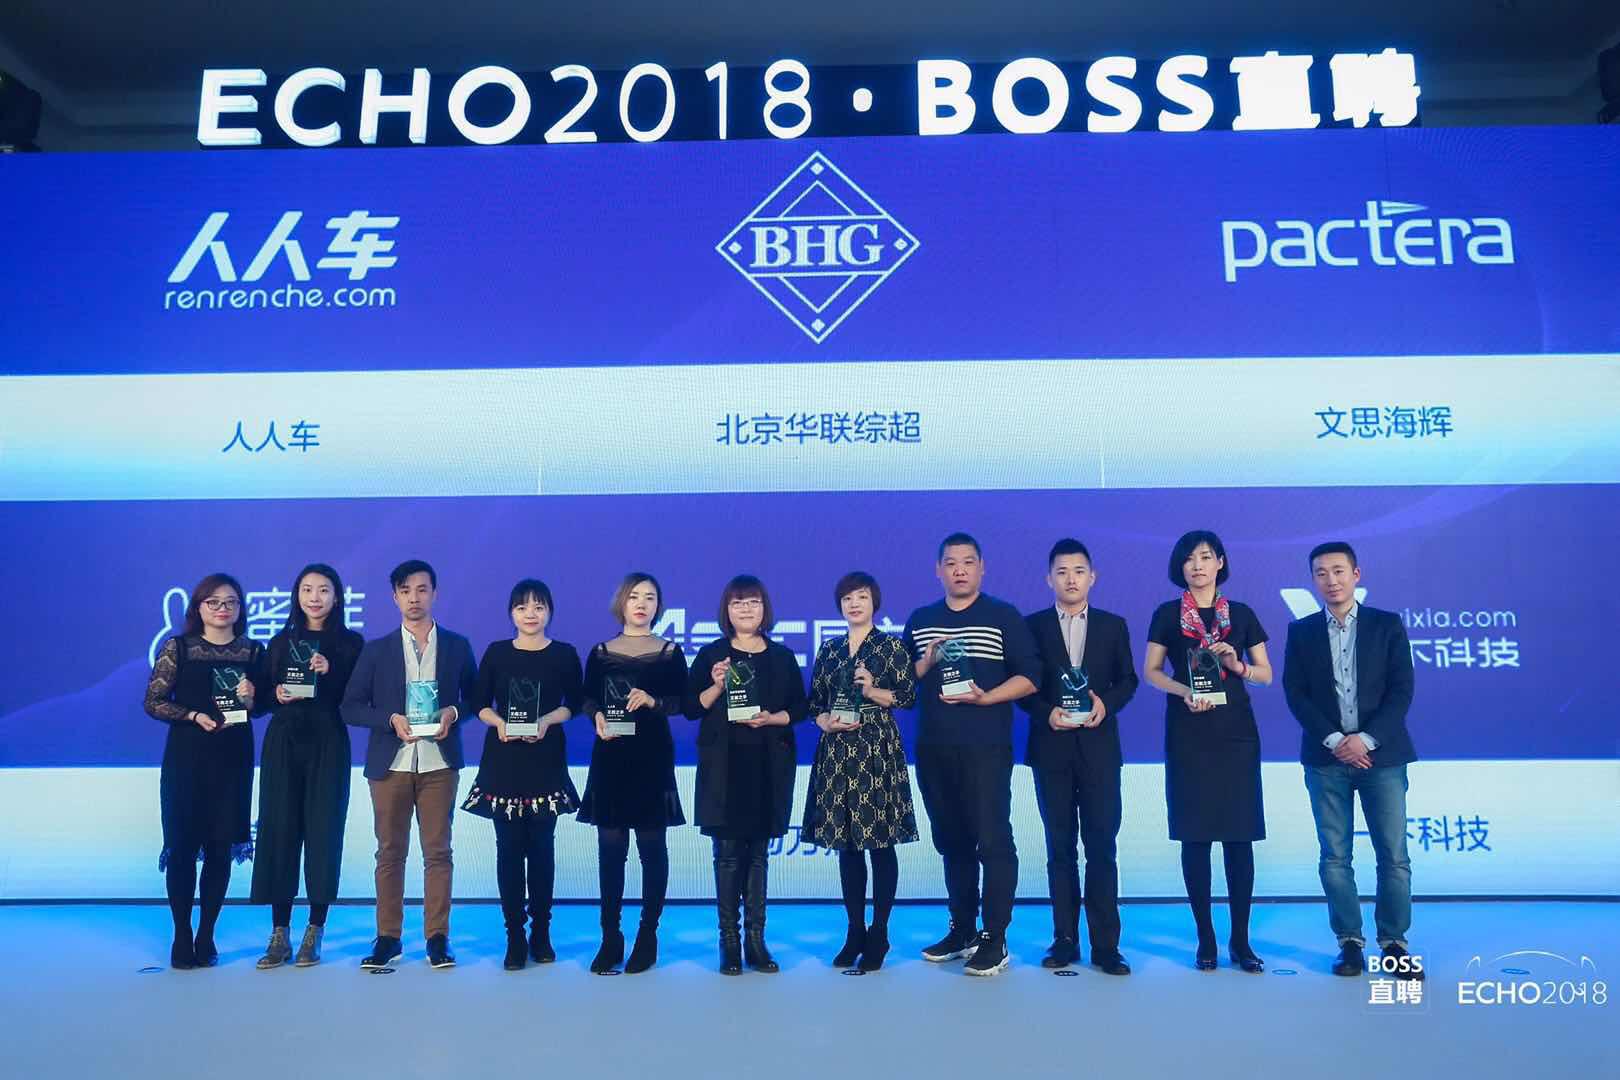 BOSS直聘ECHO 2018 发布最爱人才HR团队榜单